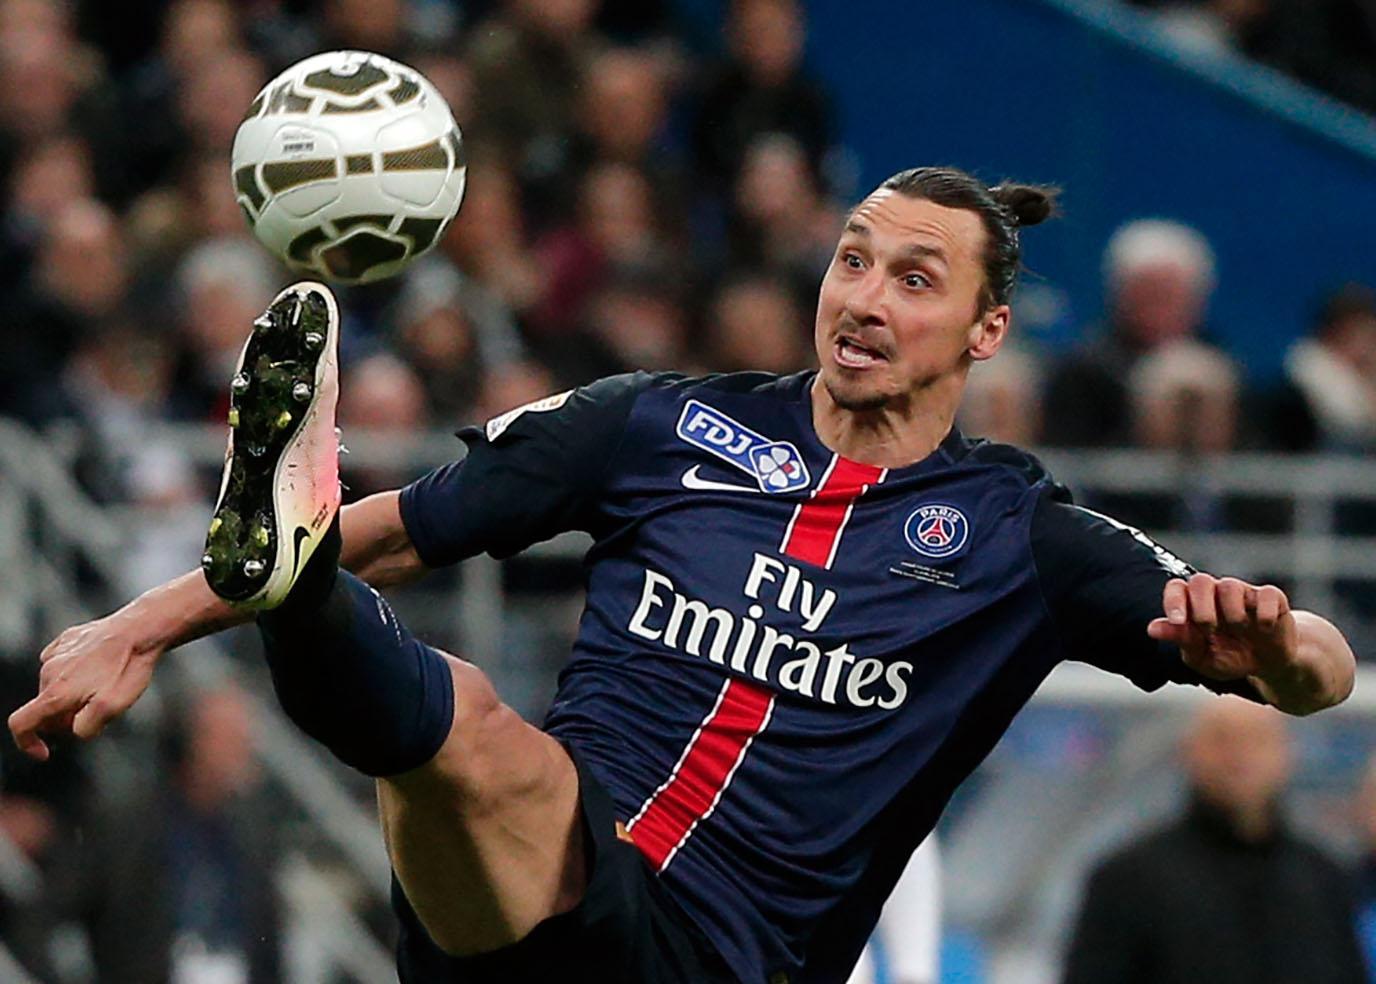 Ibrahimovic says he will leave PSG at the end of the season - Washington Times